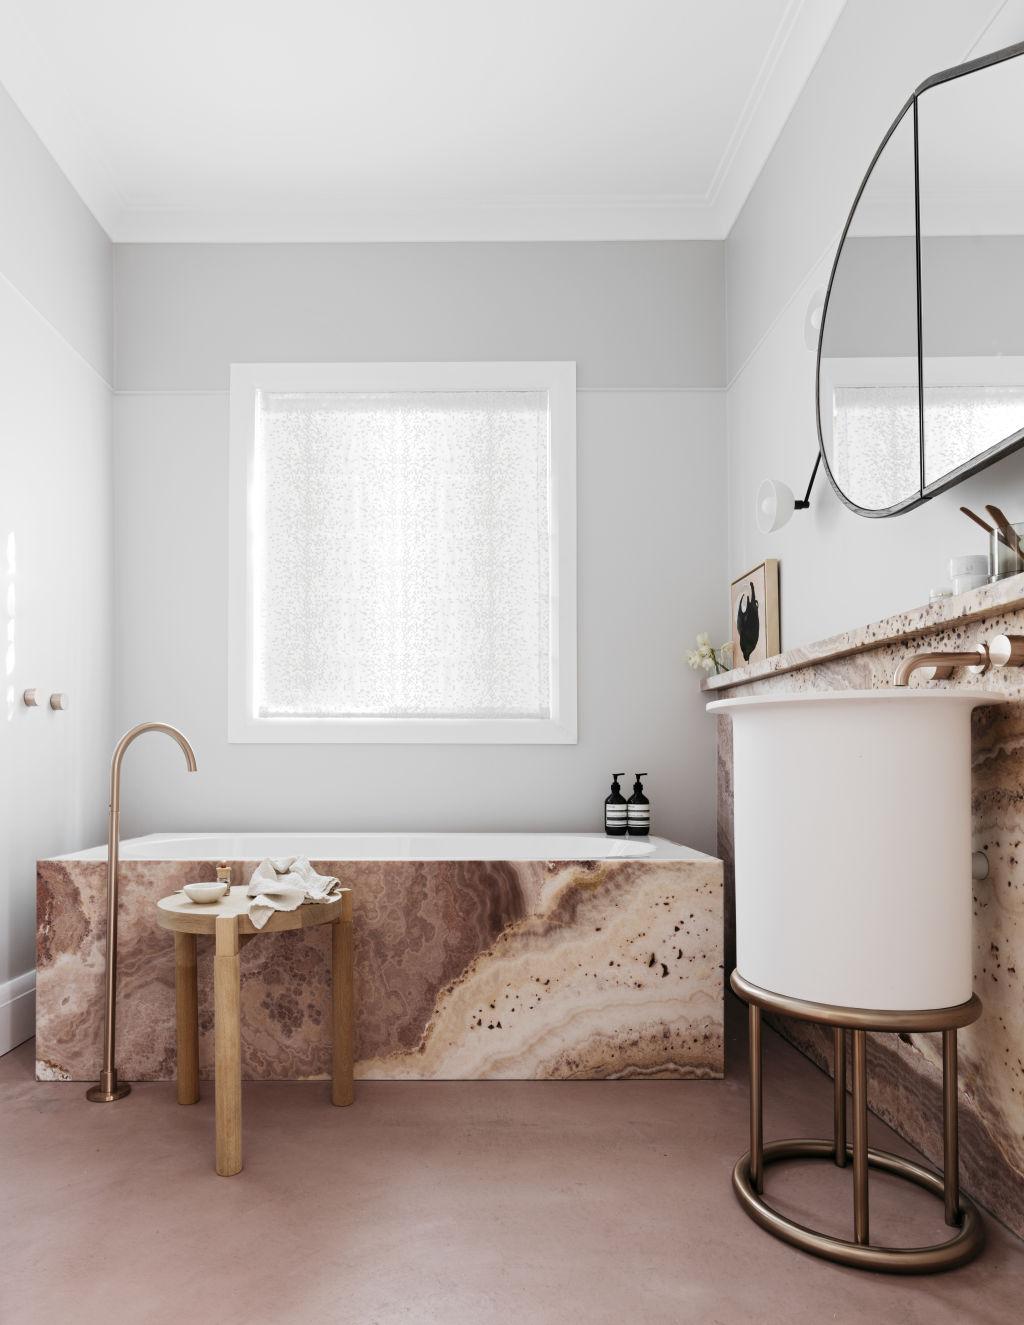 Decus_Interiors_Woollahra_House-6948_ywotvx